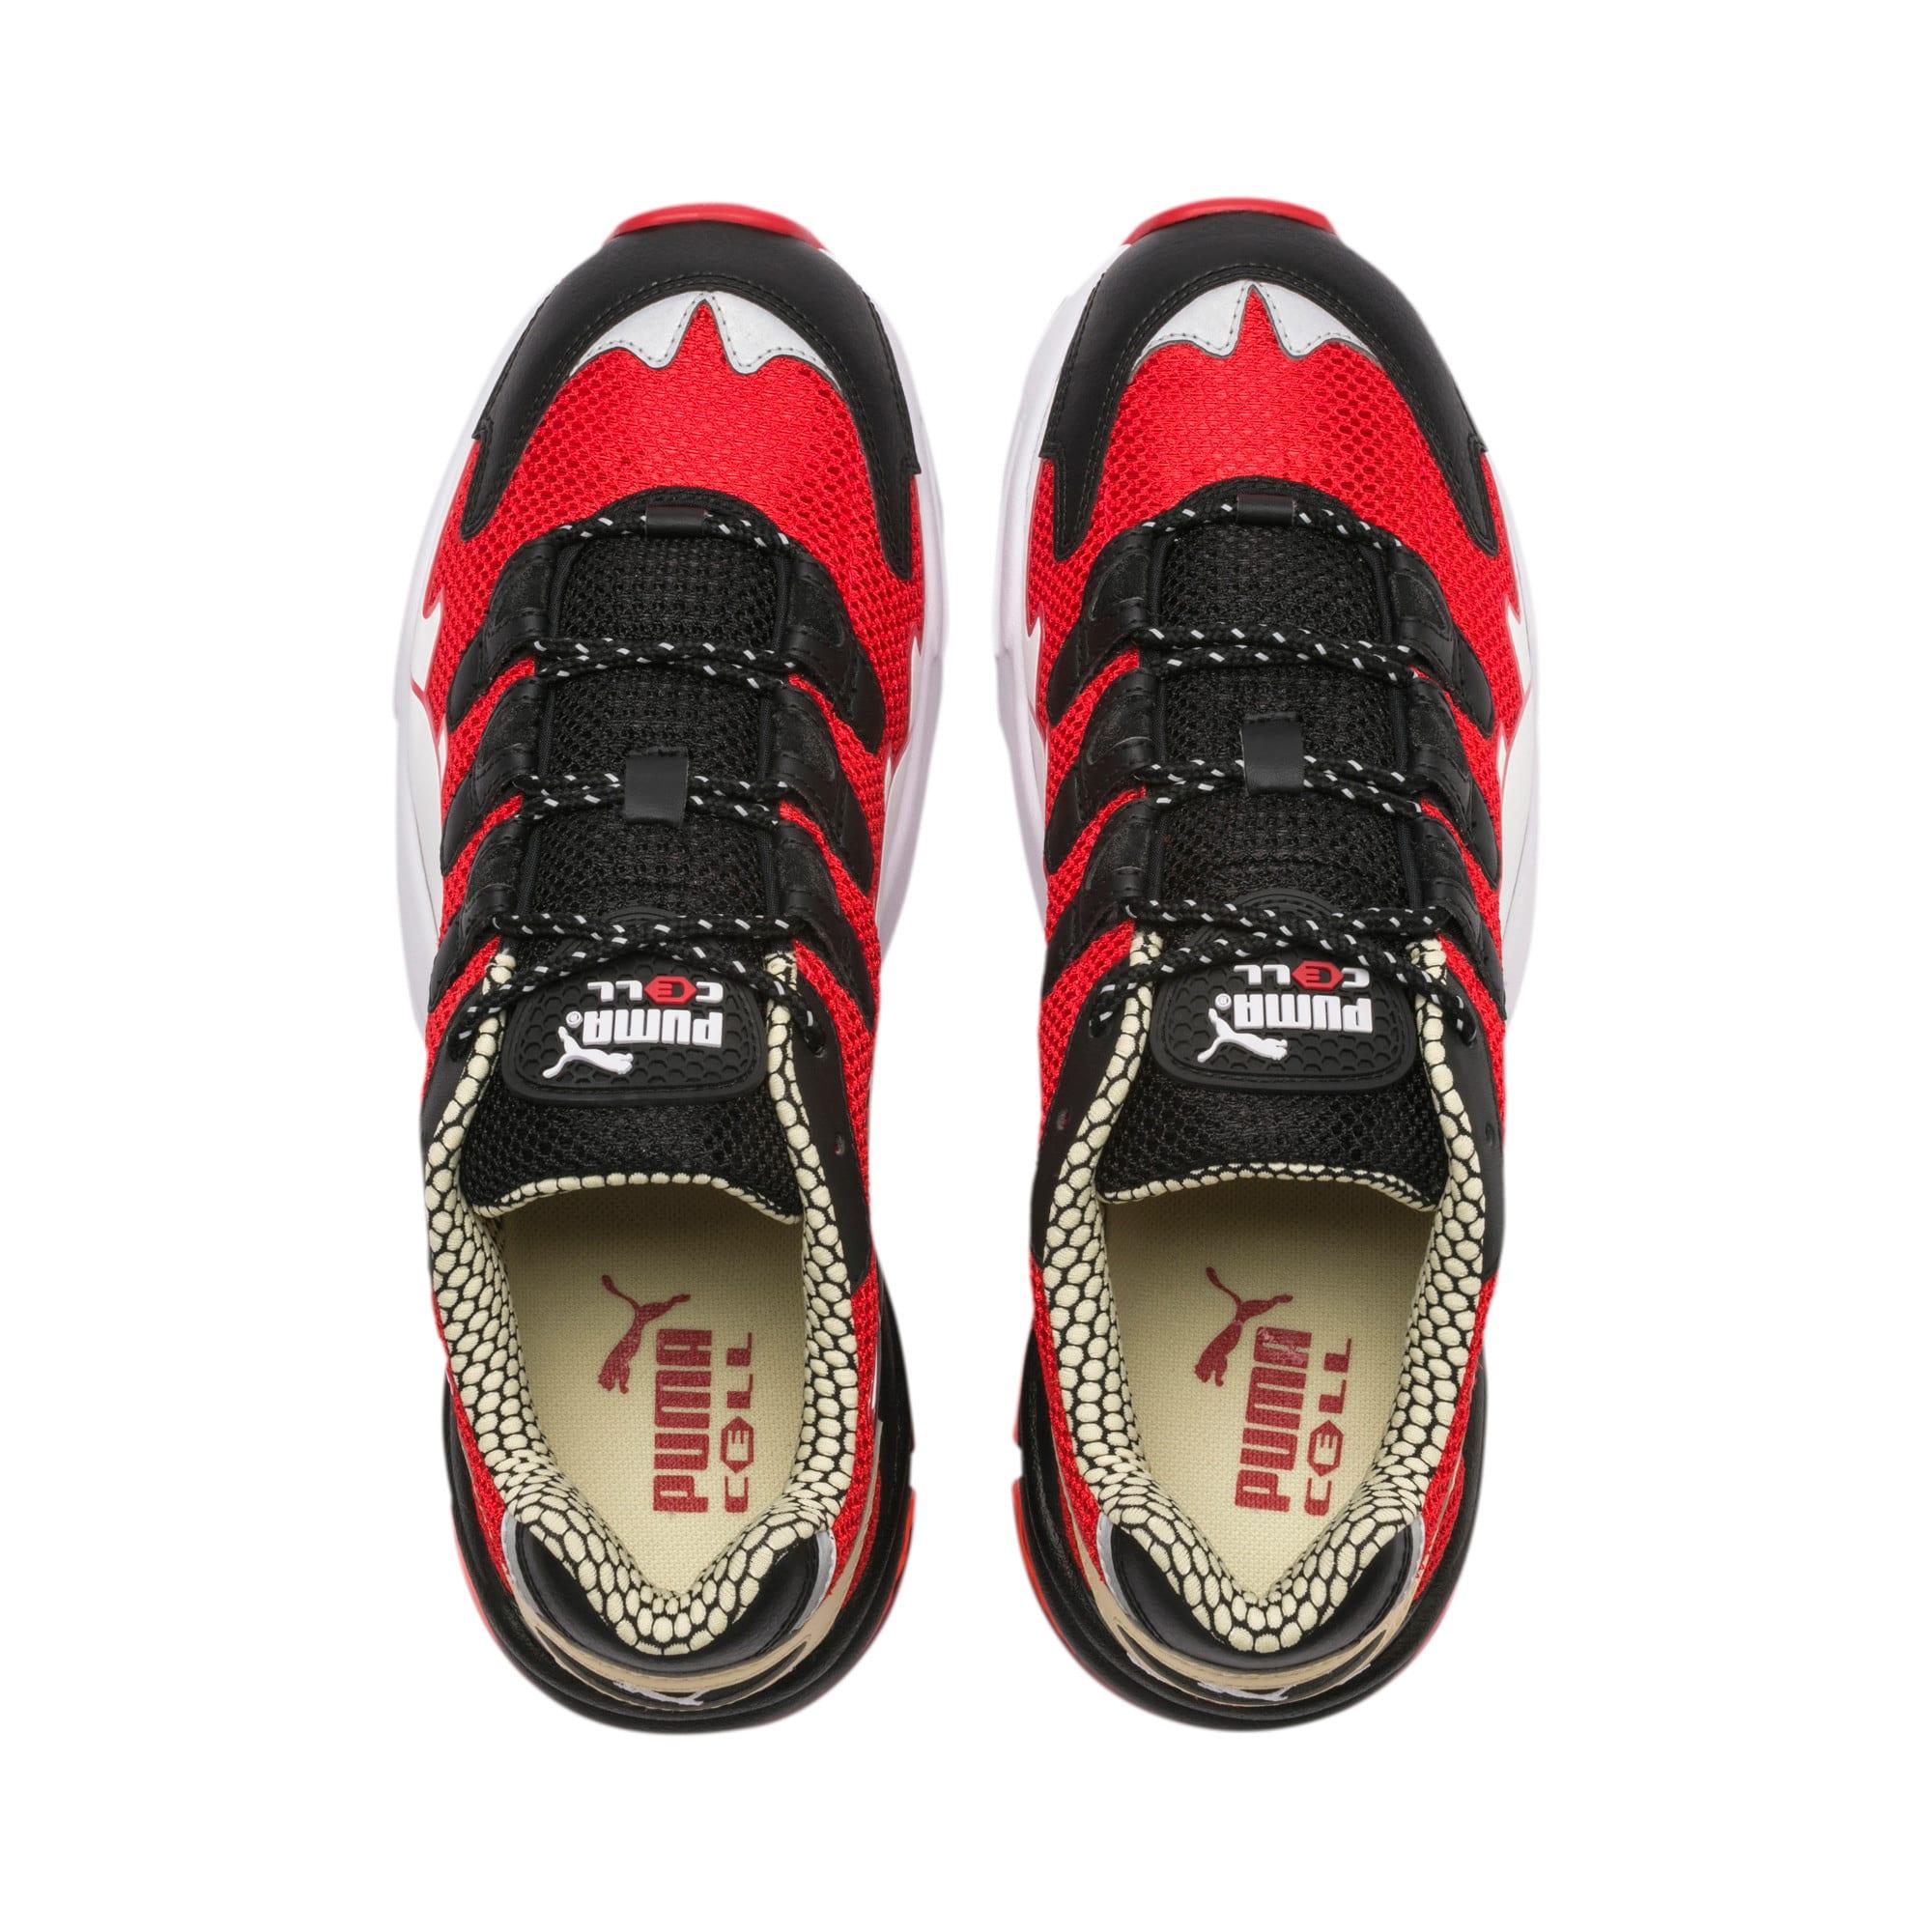 Thumbnail 7 of CELL Alien Kotto sportschoenen, High Risk Red-Puma Black, medium